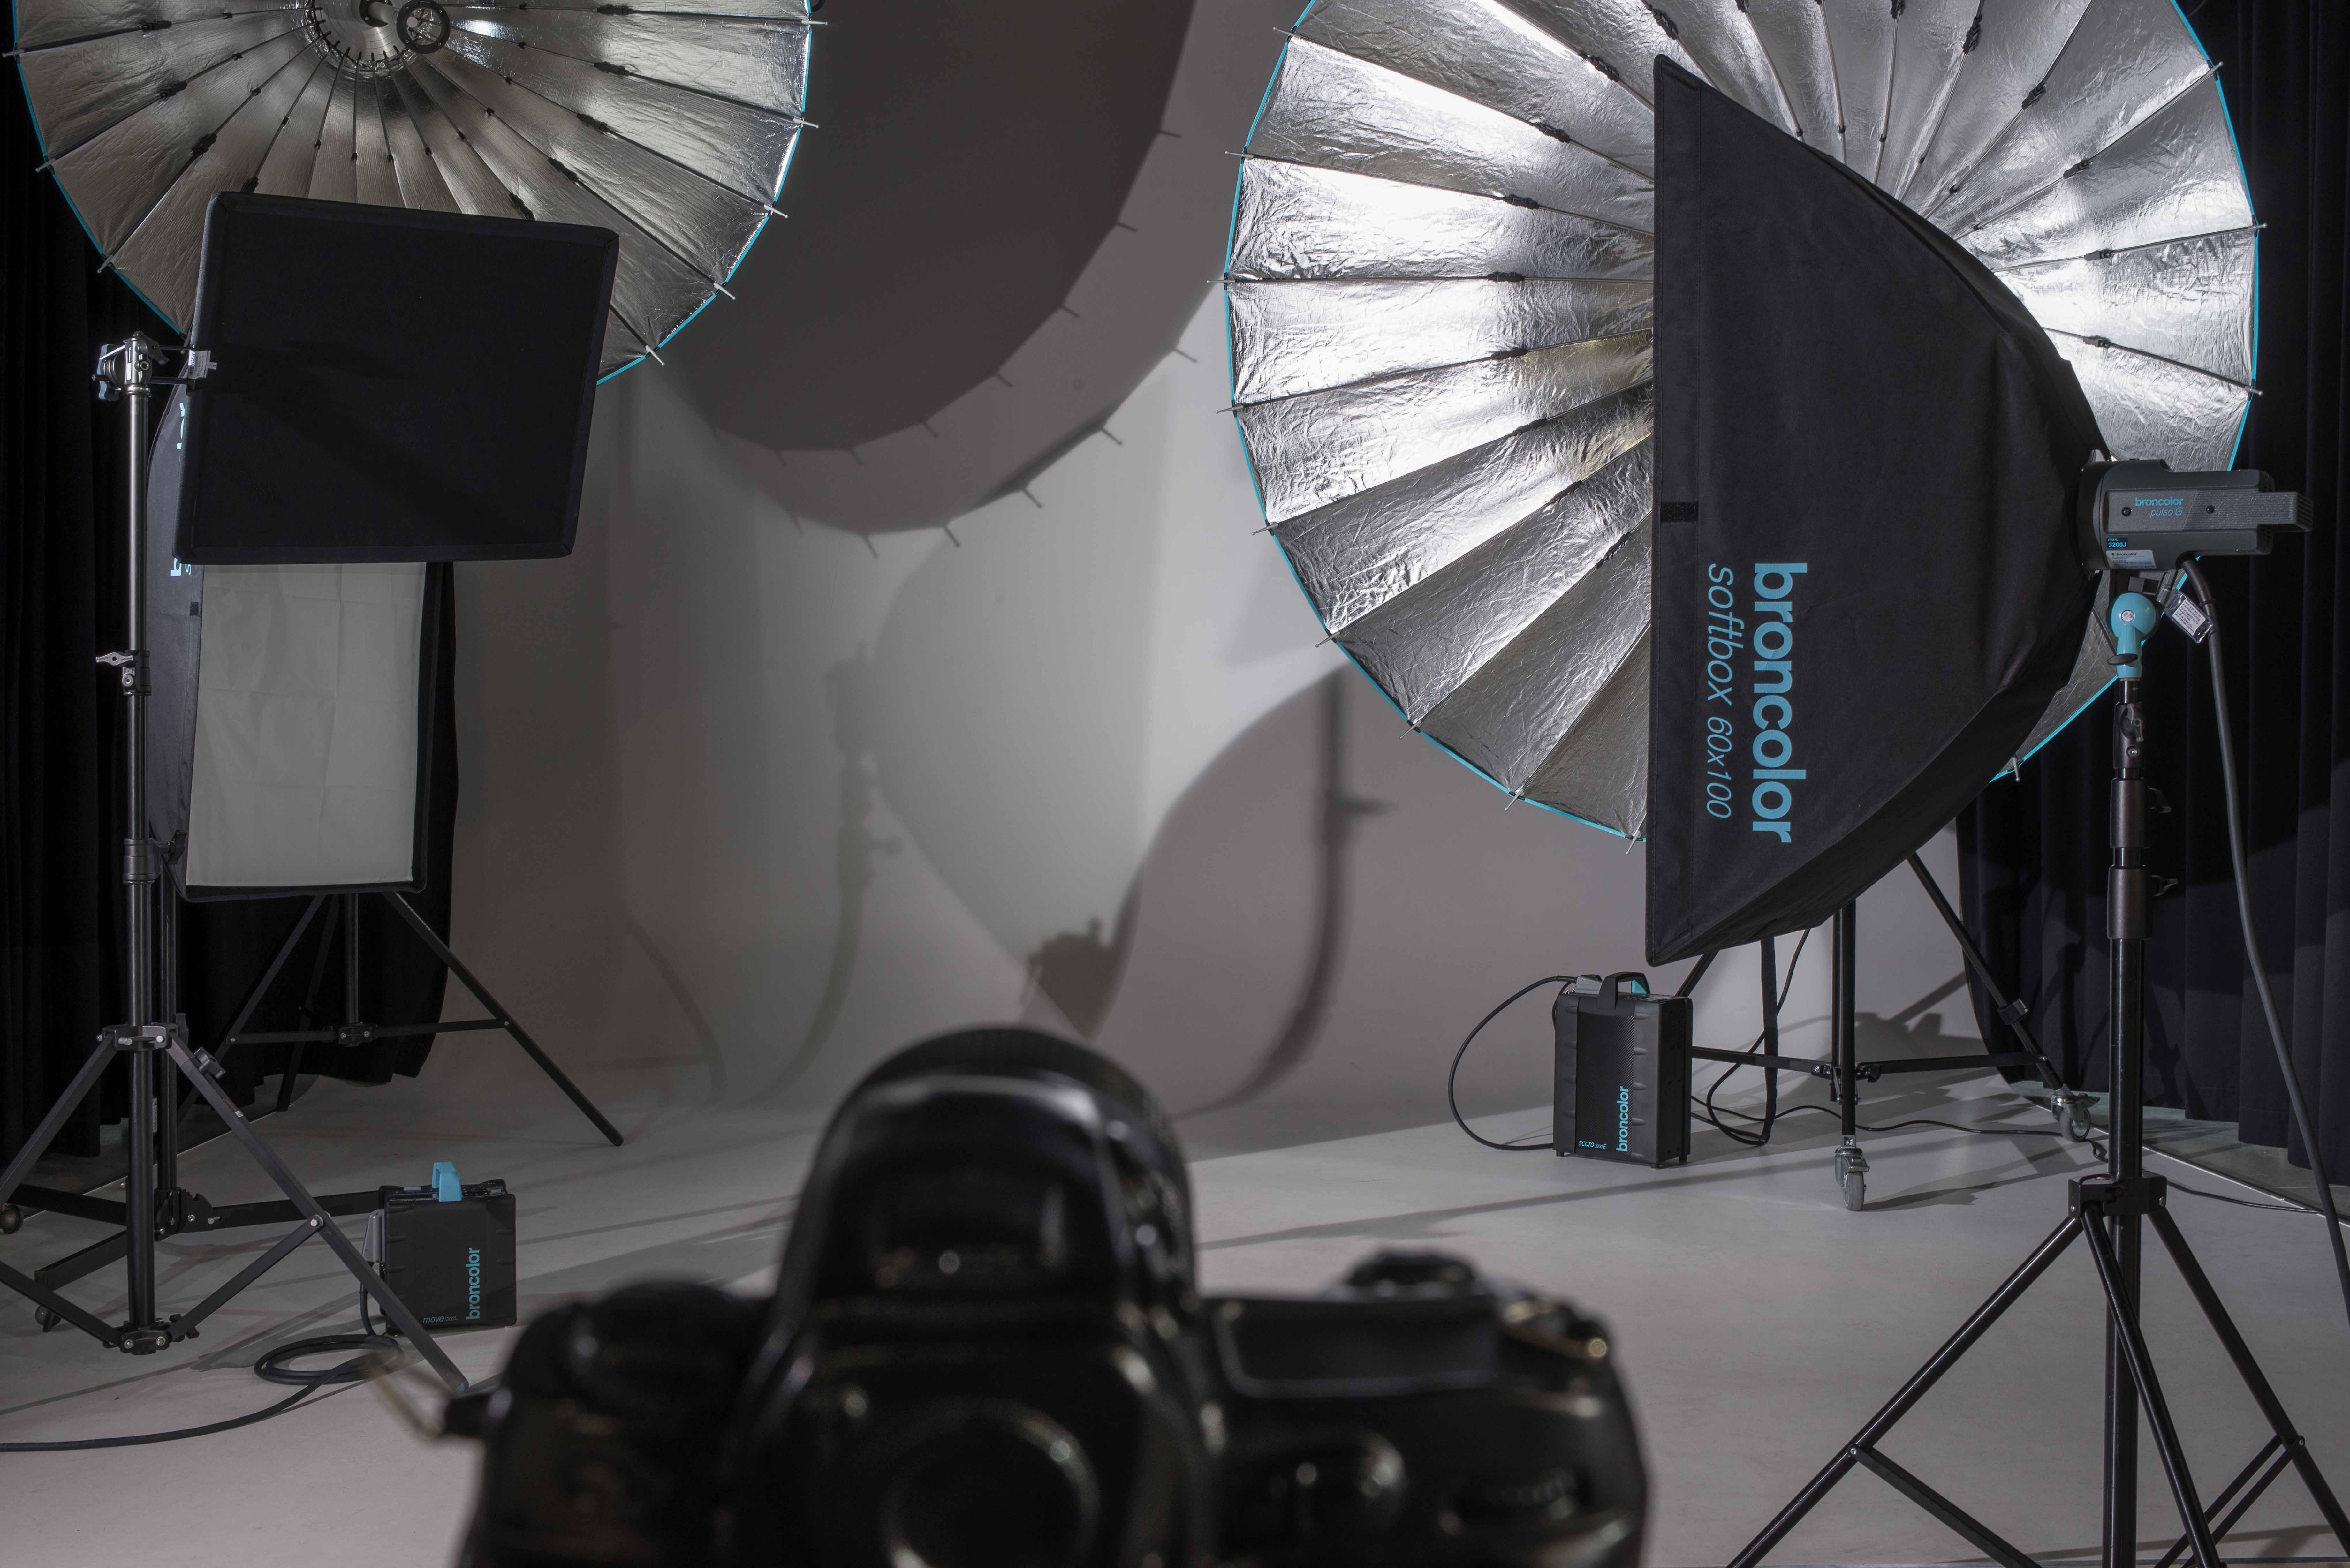 fpimagine studio light workshop